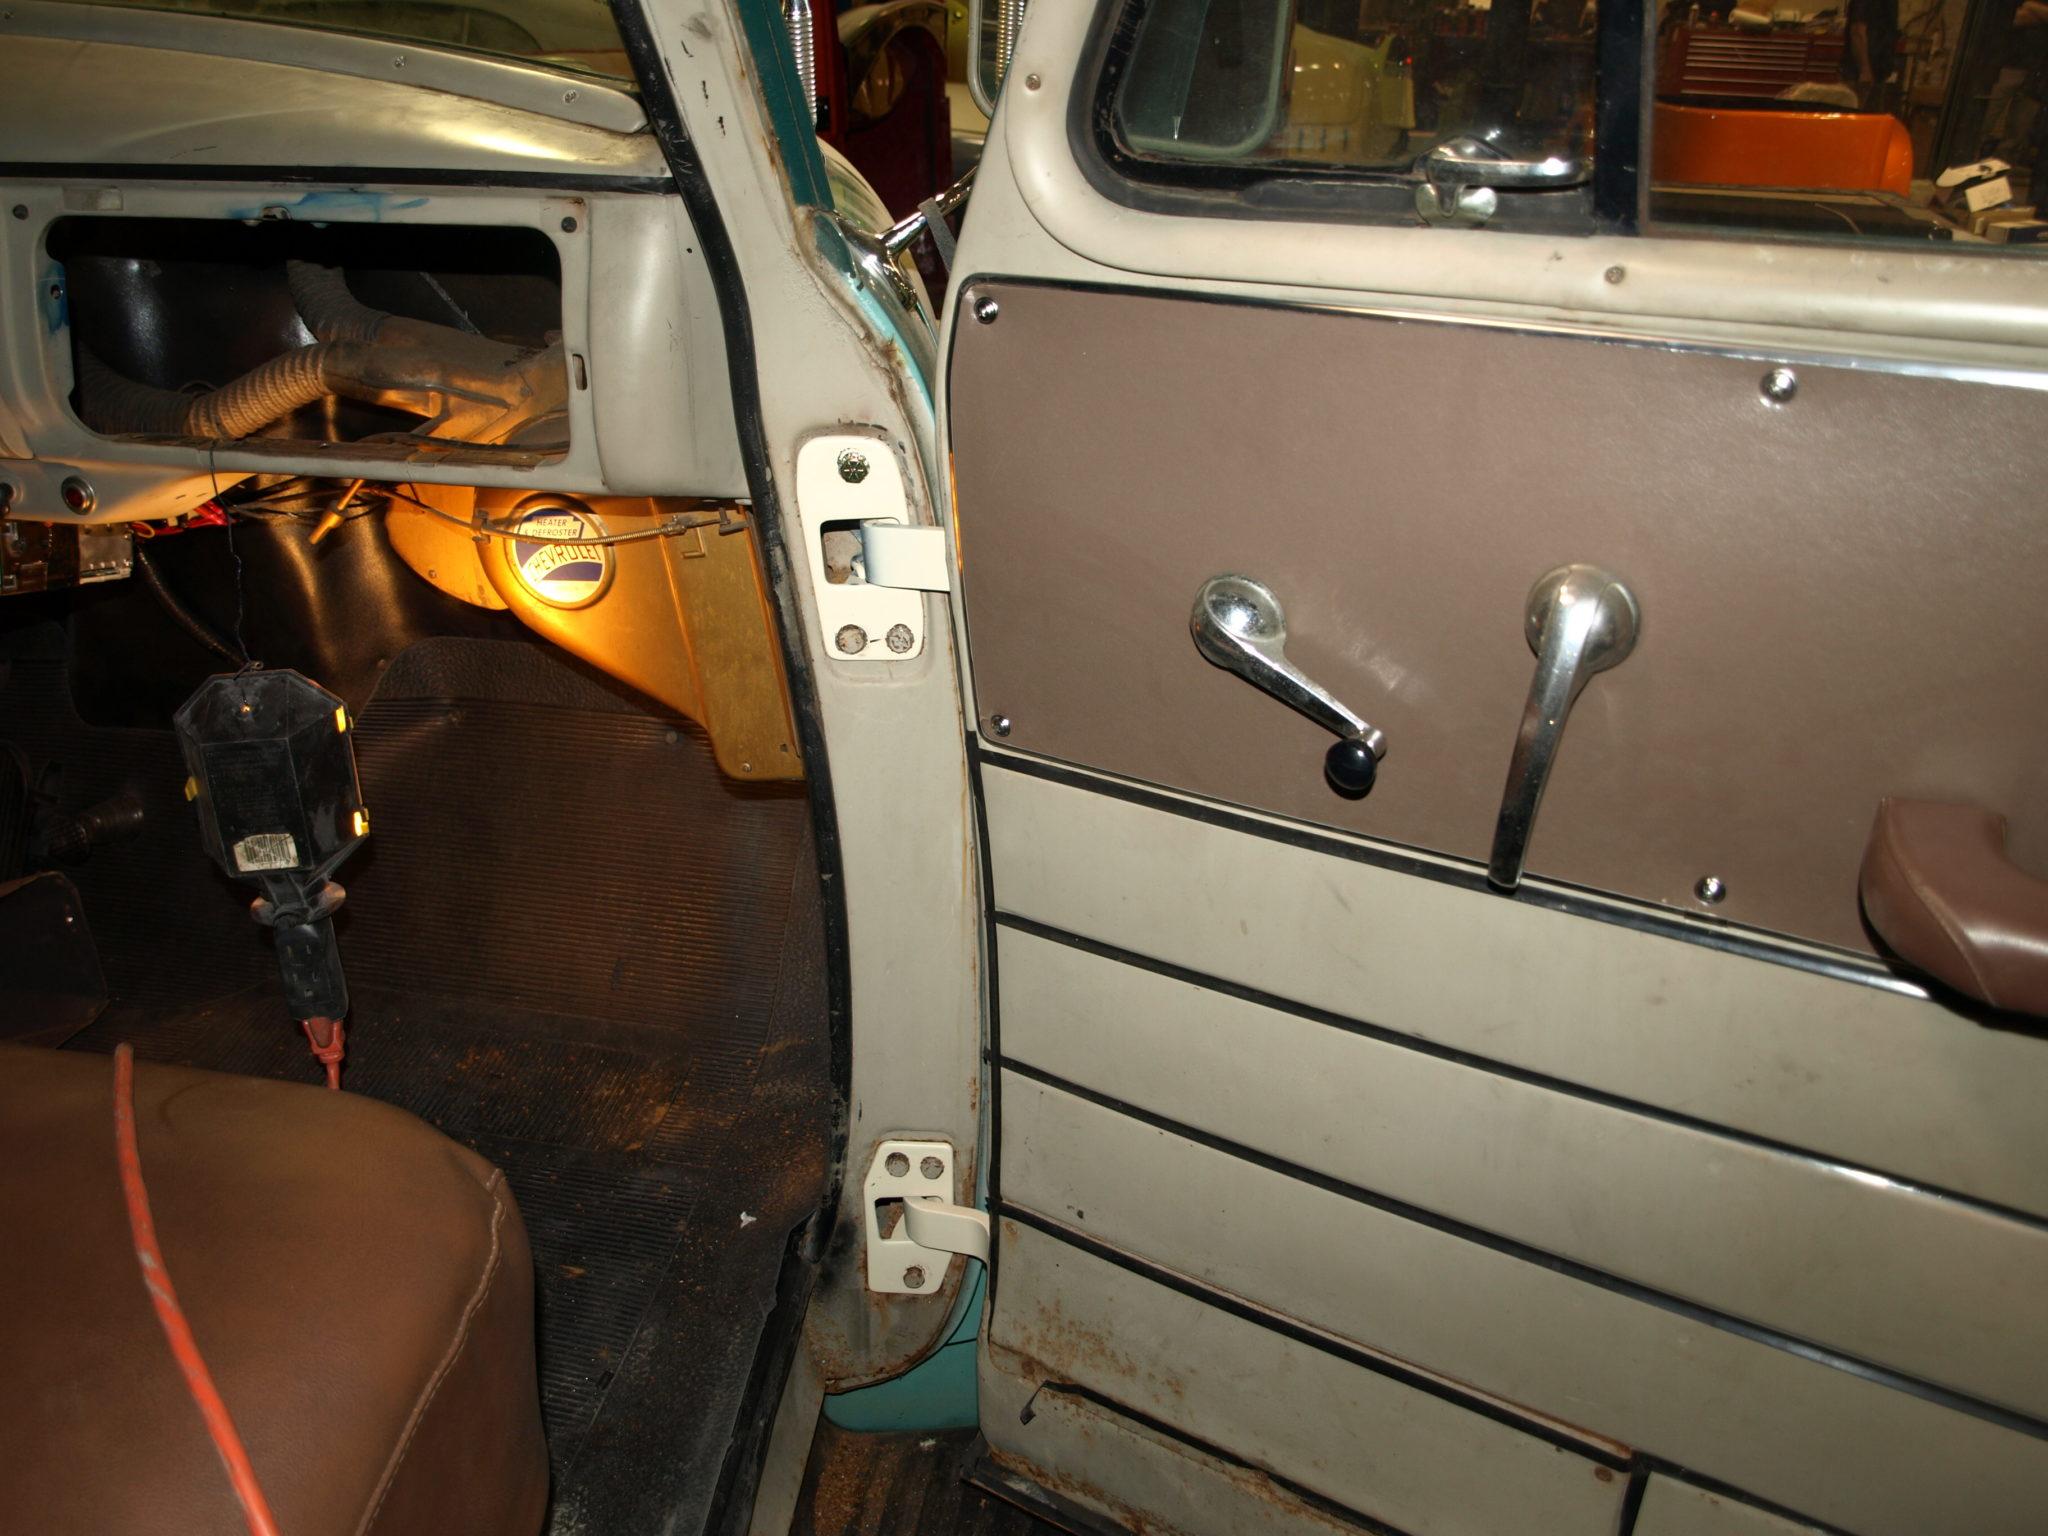 1949 Chevy Pickup - Precision Car Restoration